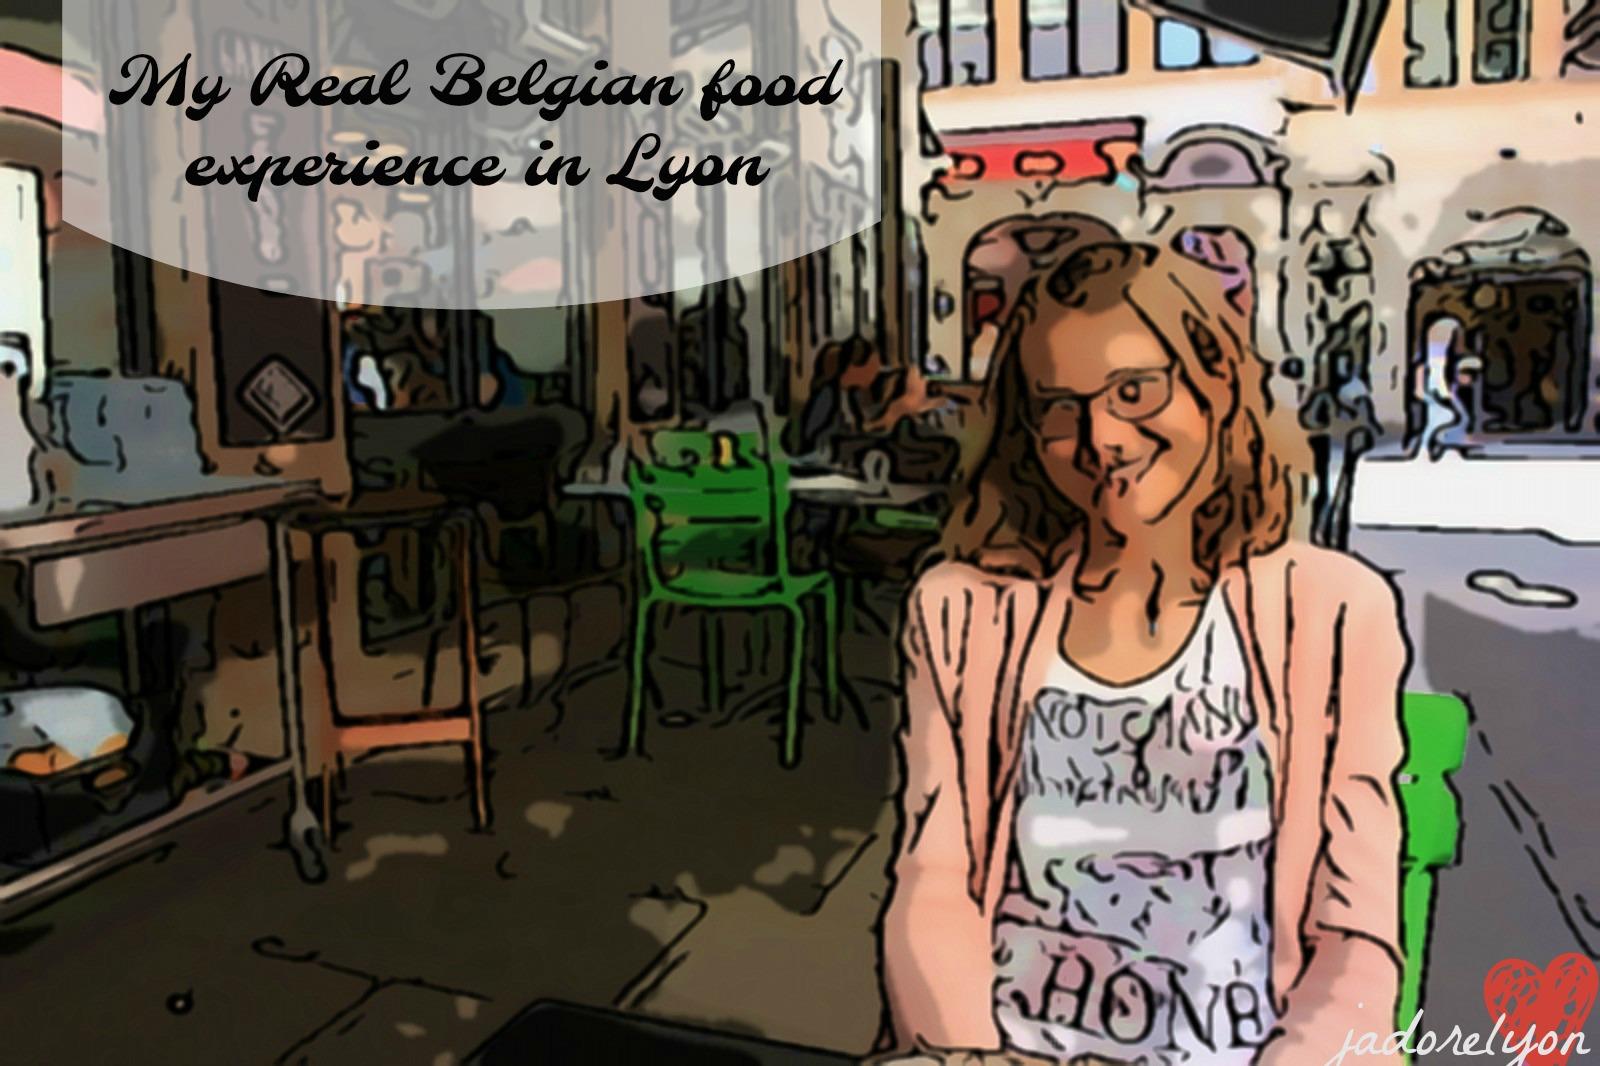 My real belgian Lyon food experience